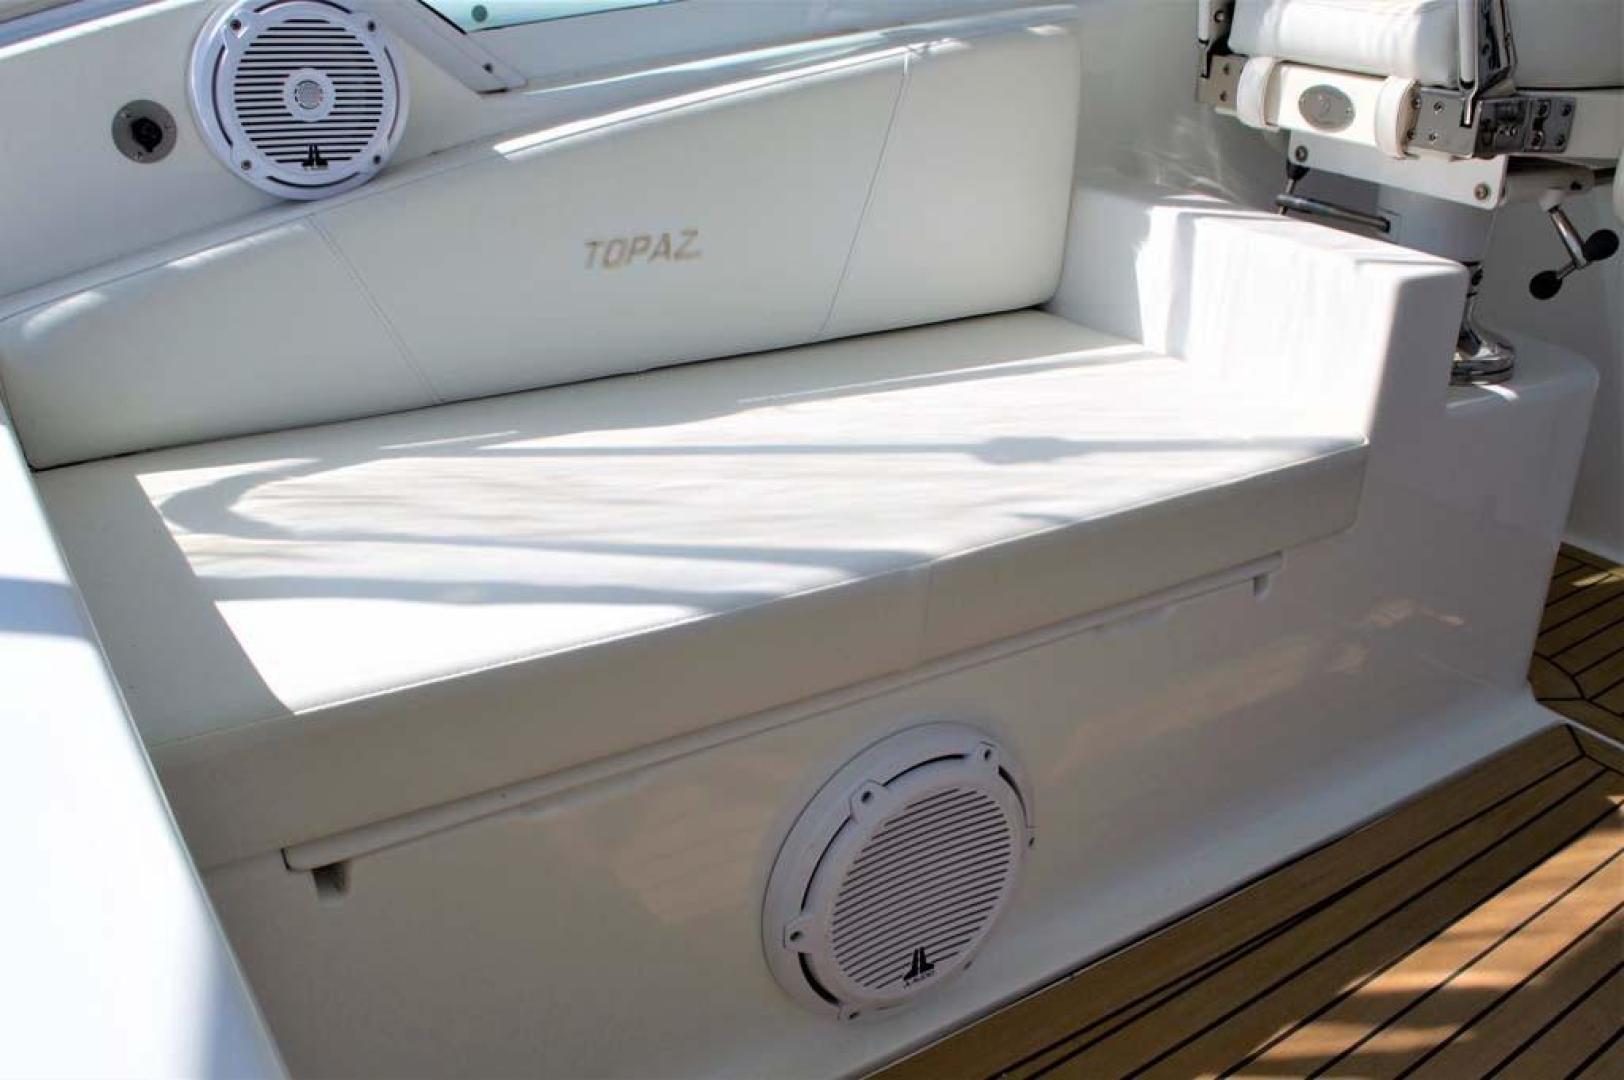 Topaz-40-Express-2006-Fin-Addict-Long-Island-New-York-United-States-Port-Seat-972495